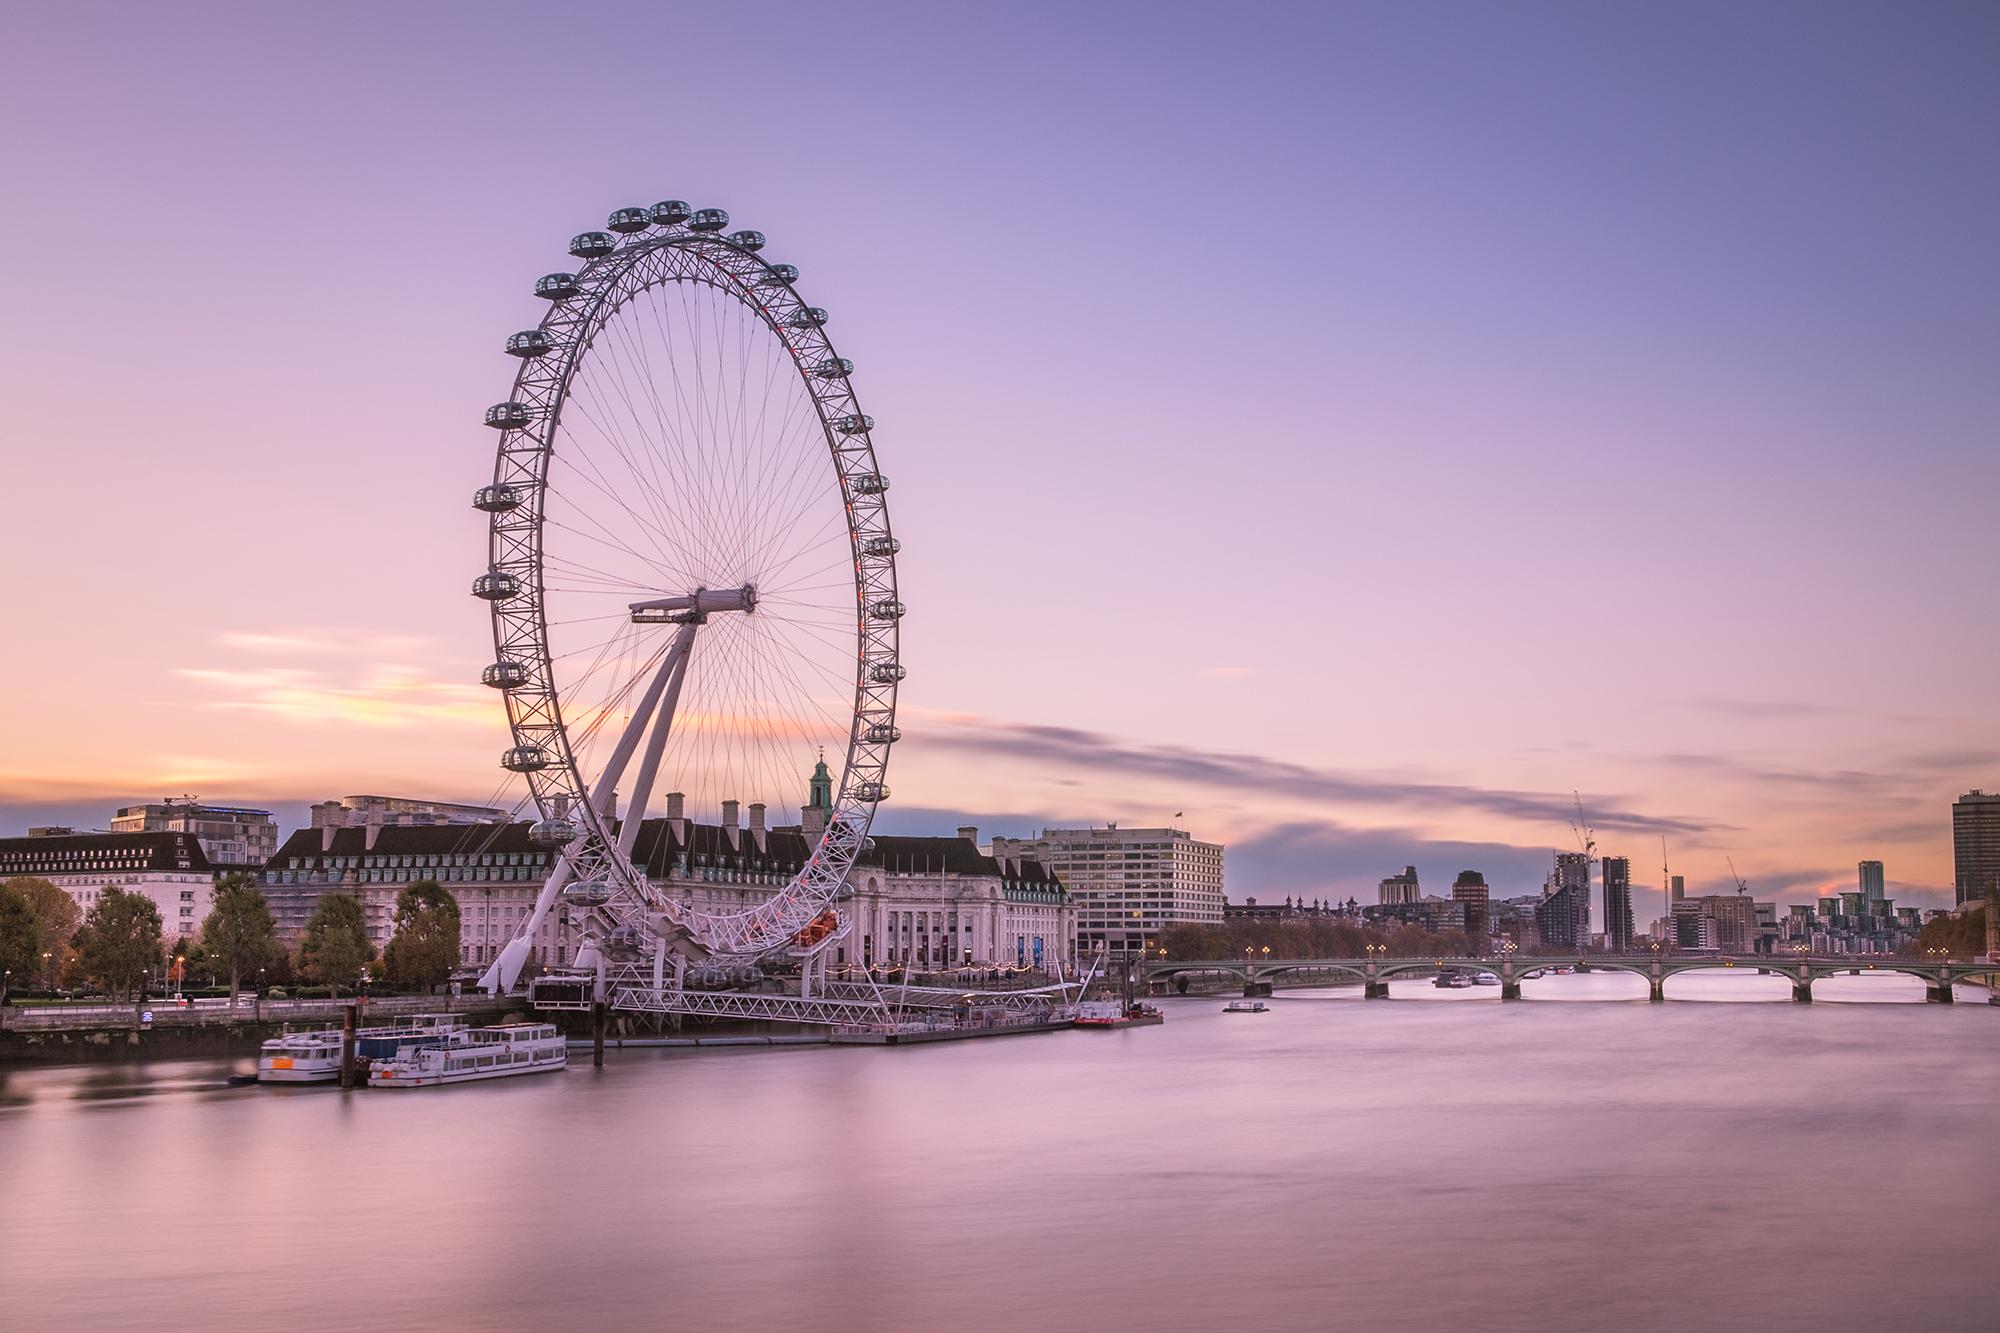 Long exposure photo of the London Eye at Sunrise taken by Trevor Sherwin